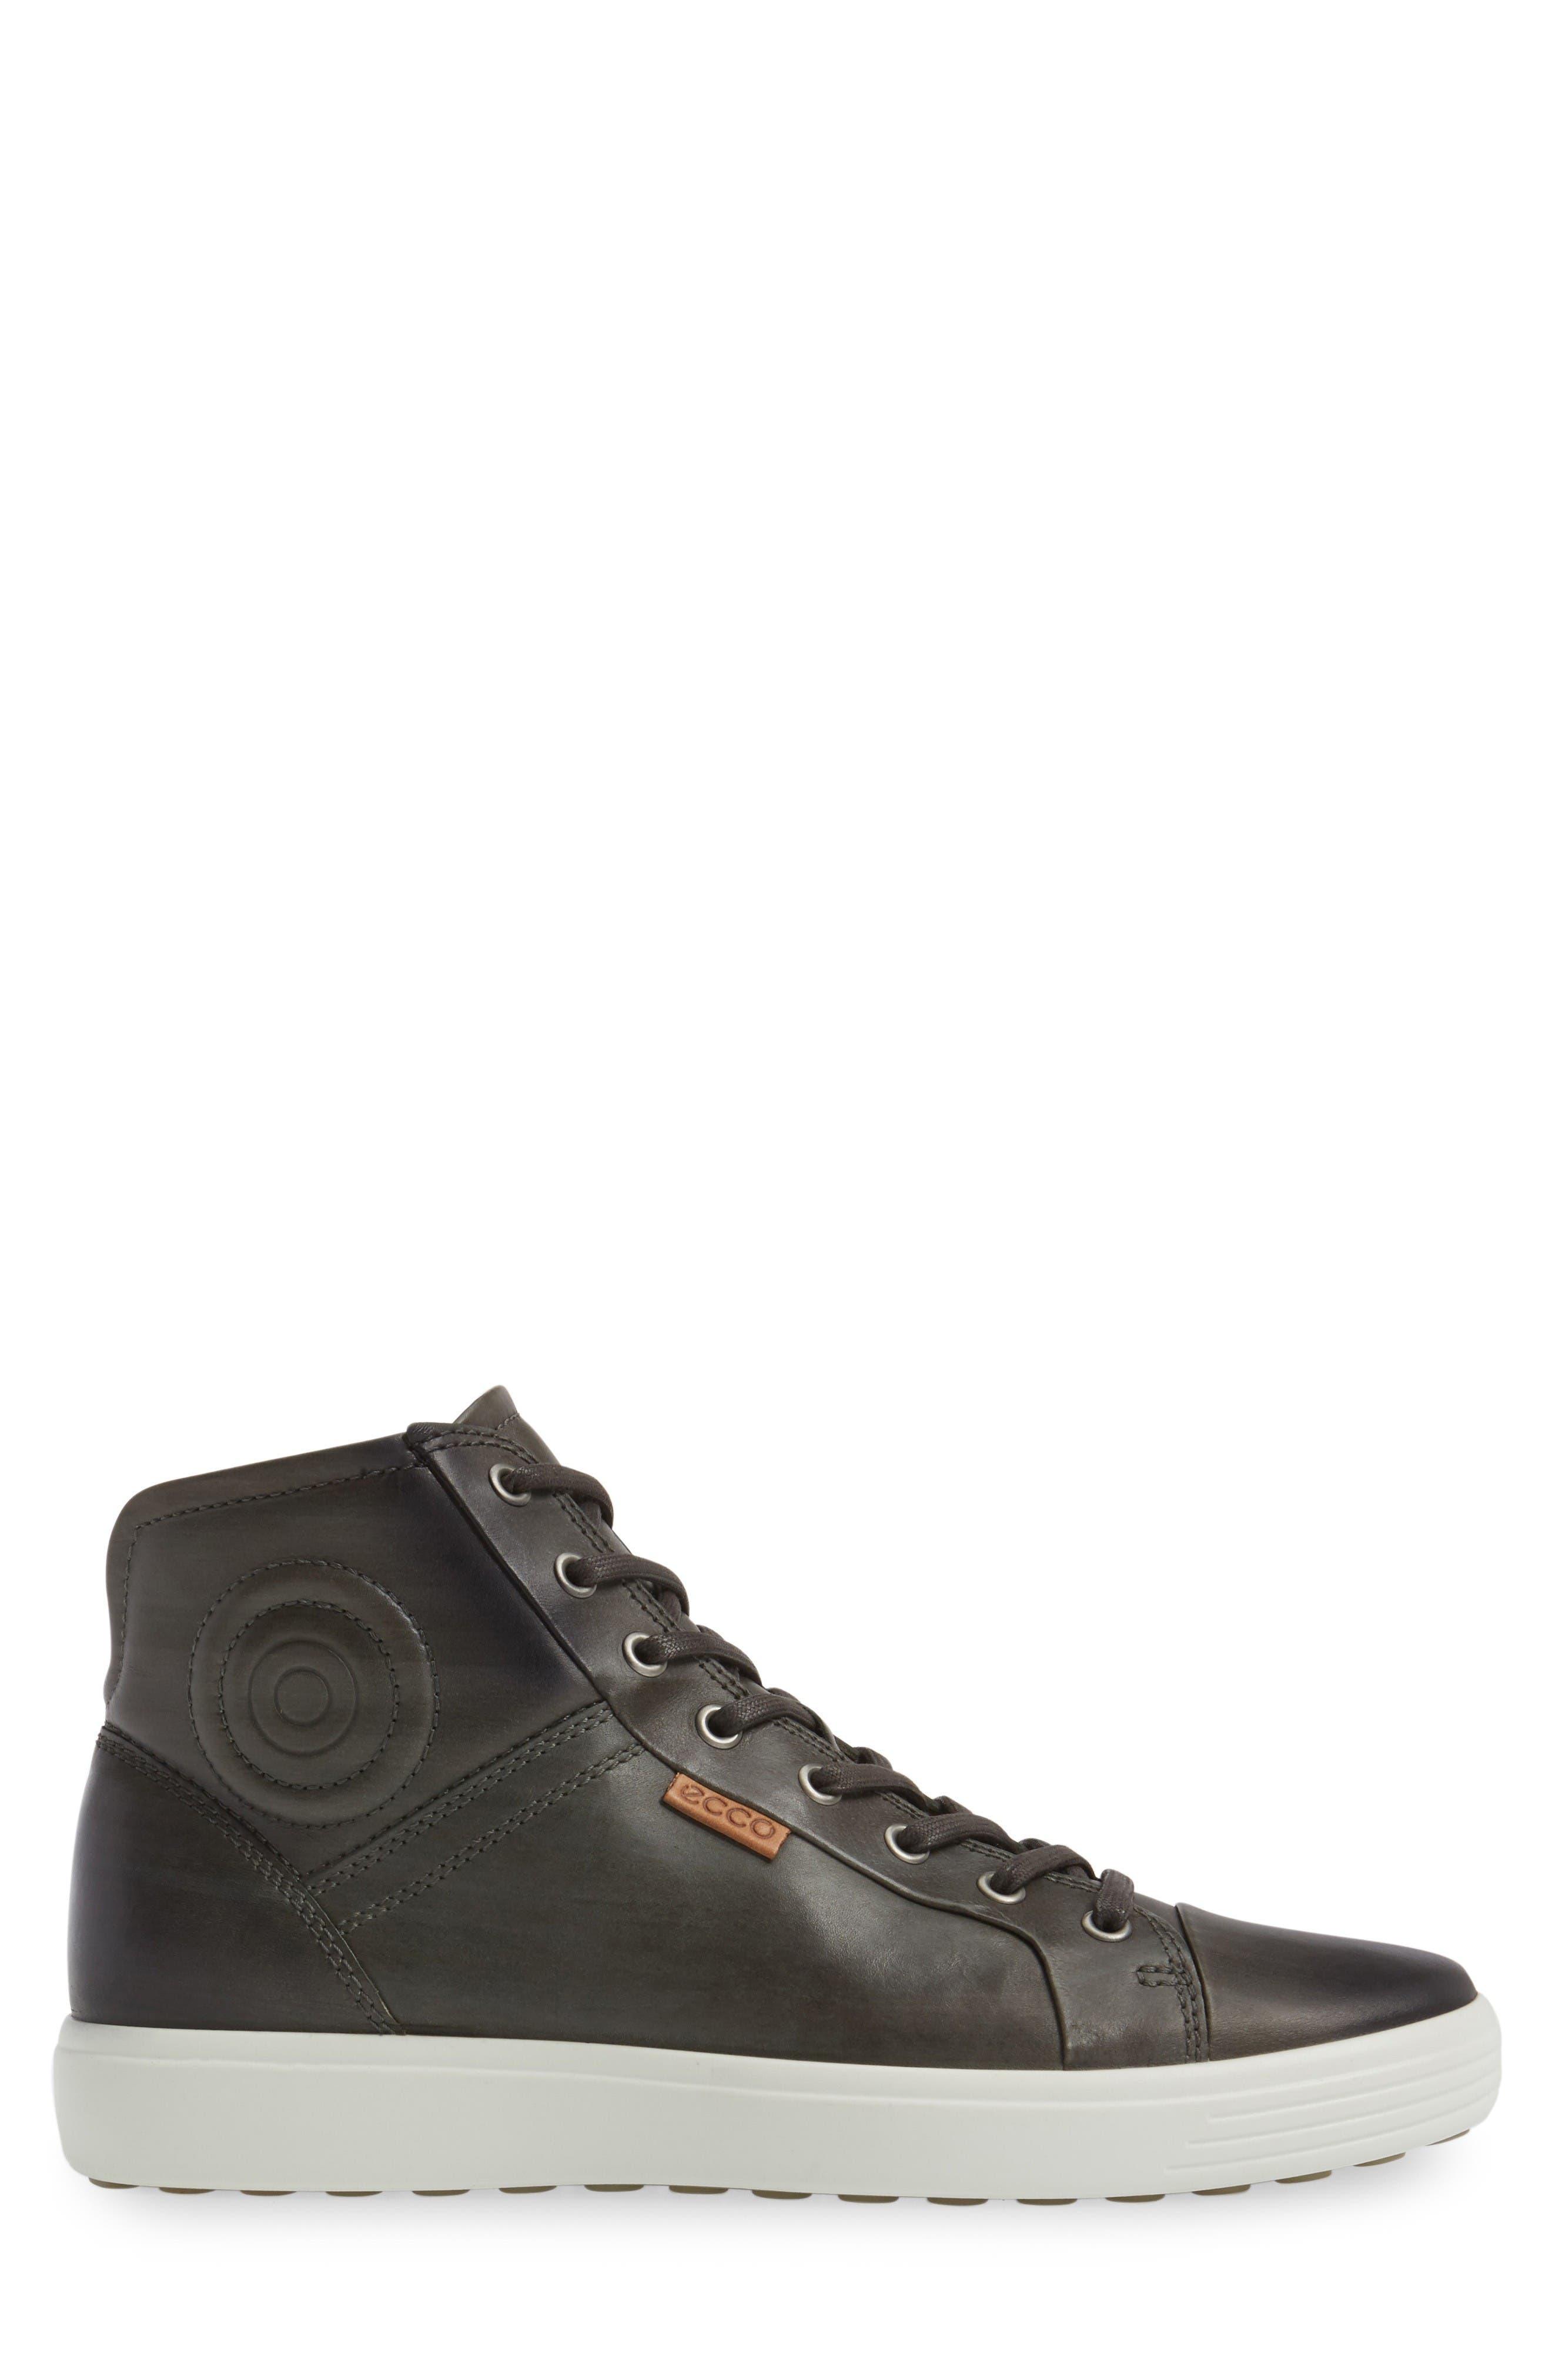 Soft 7 High Top Sneaker,                             Alternate thumbnail 3, color,                             Forrest